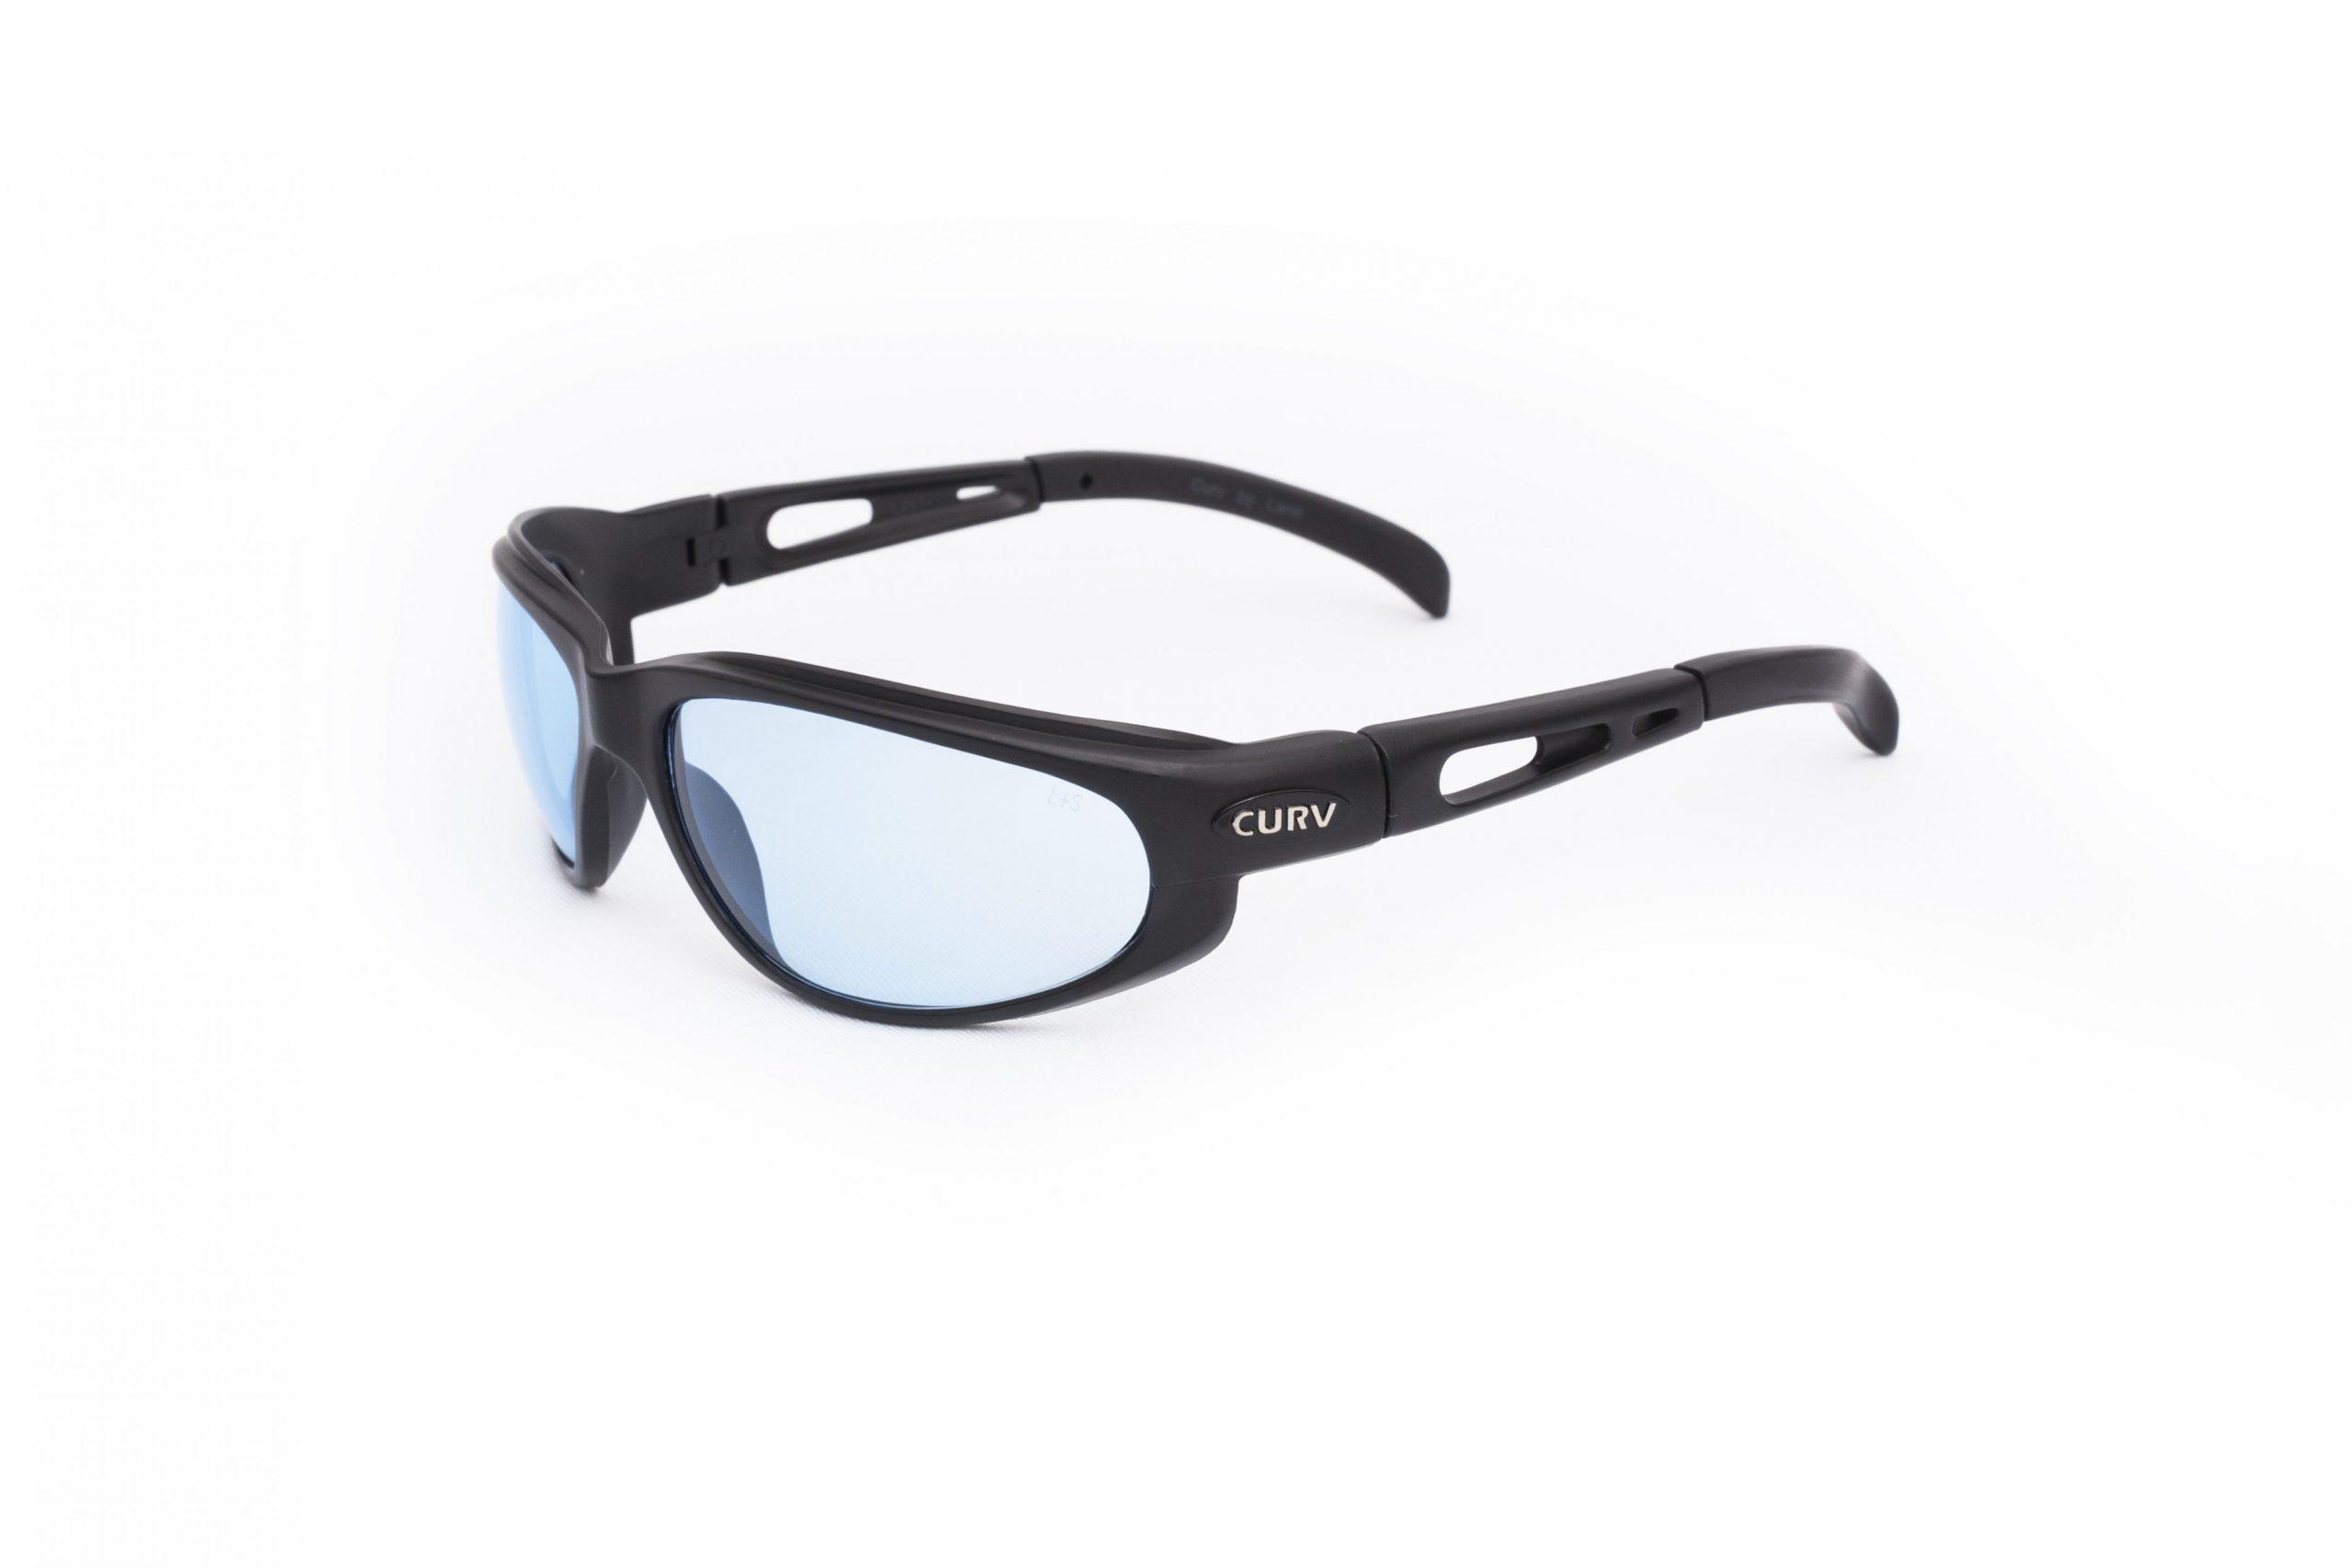 01-03 - Curv Blue Lens Sunglasses with Matte Black Frames